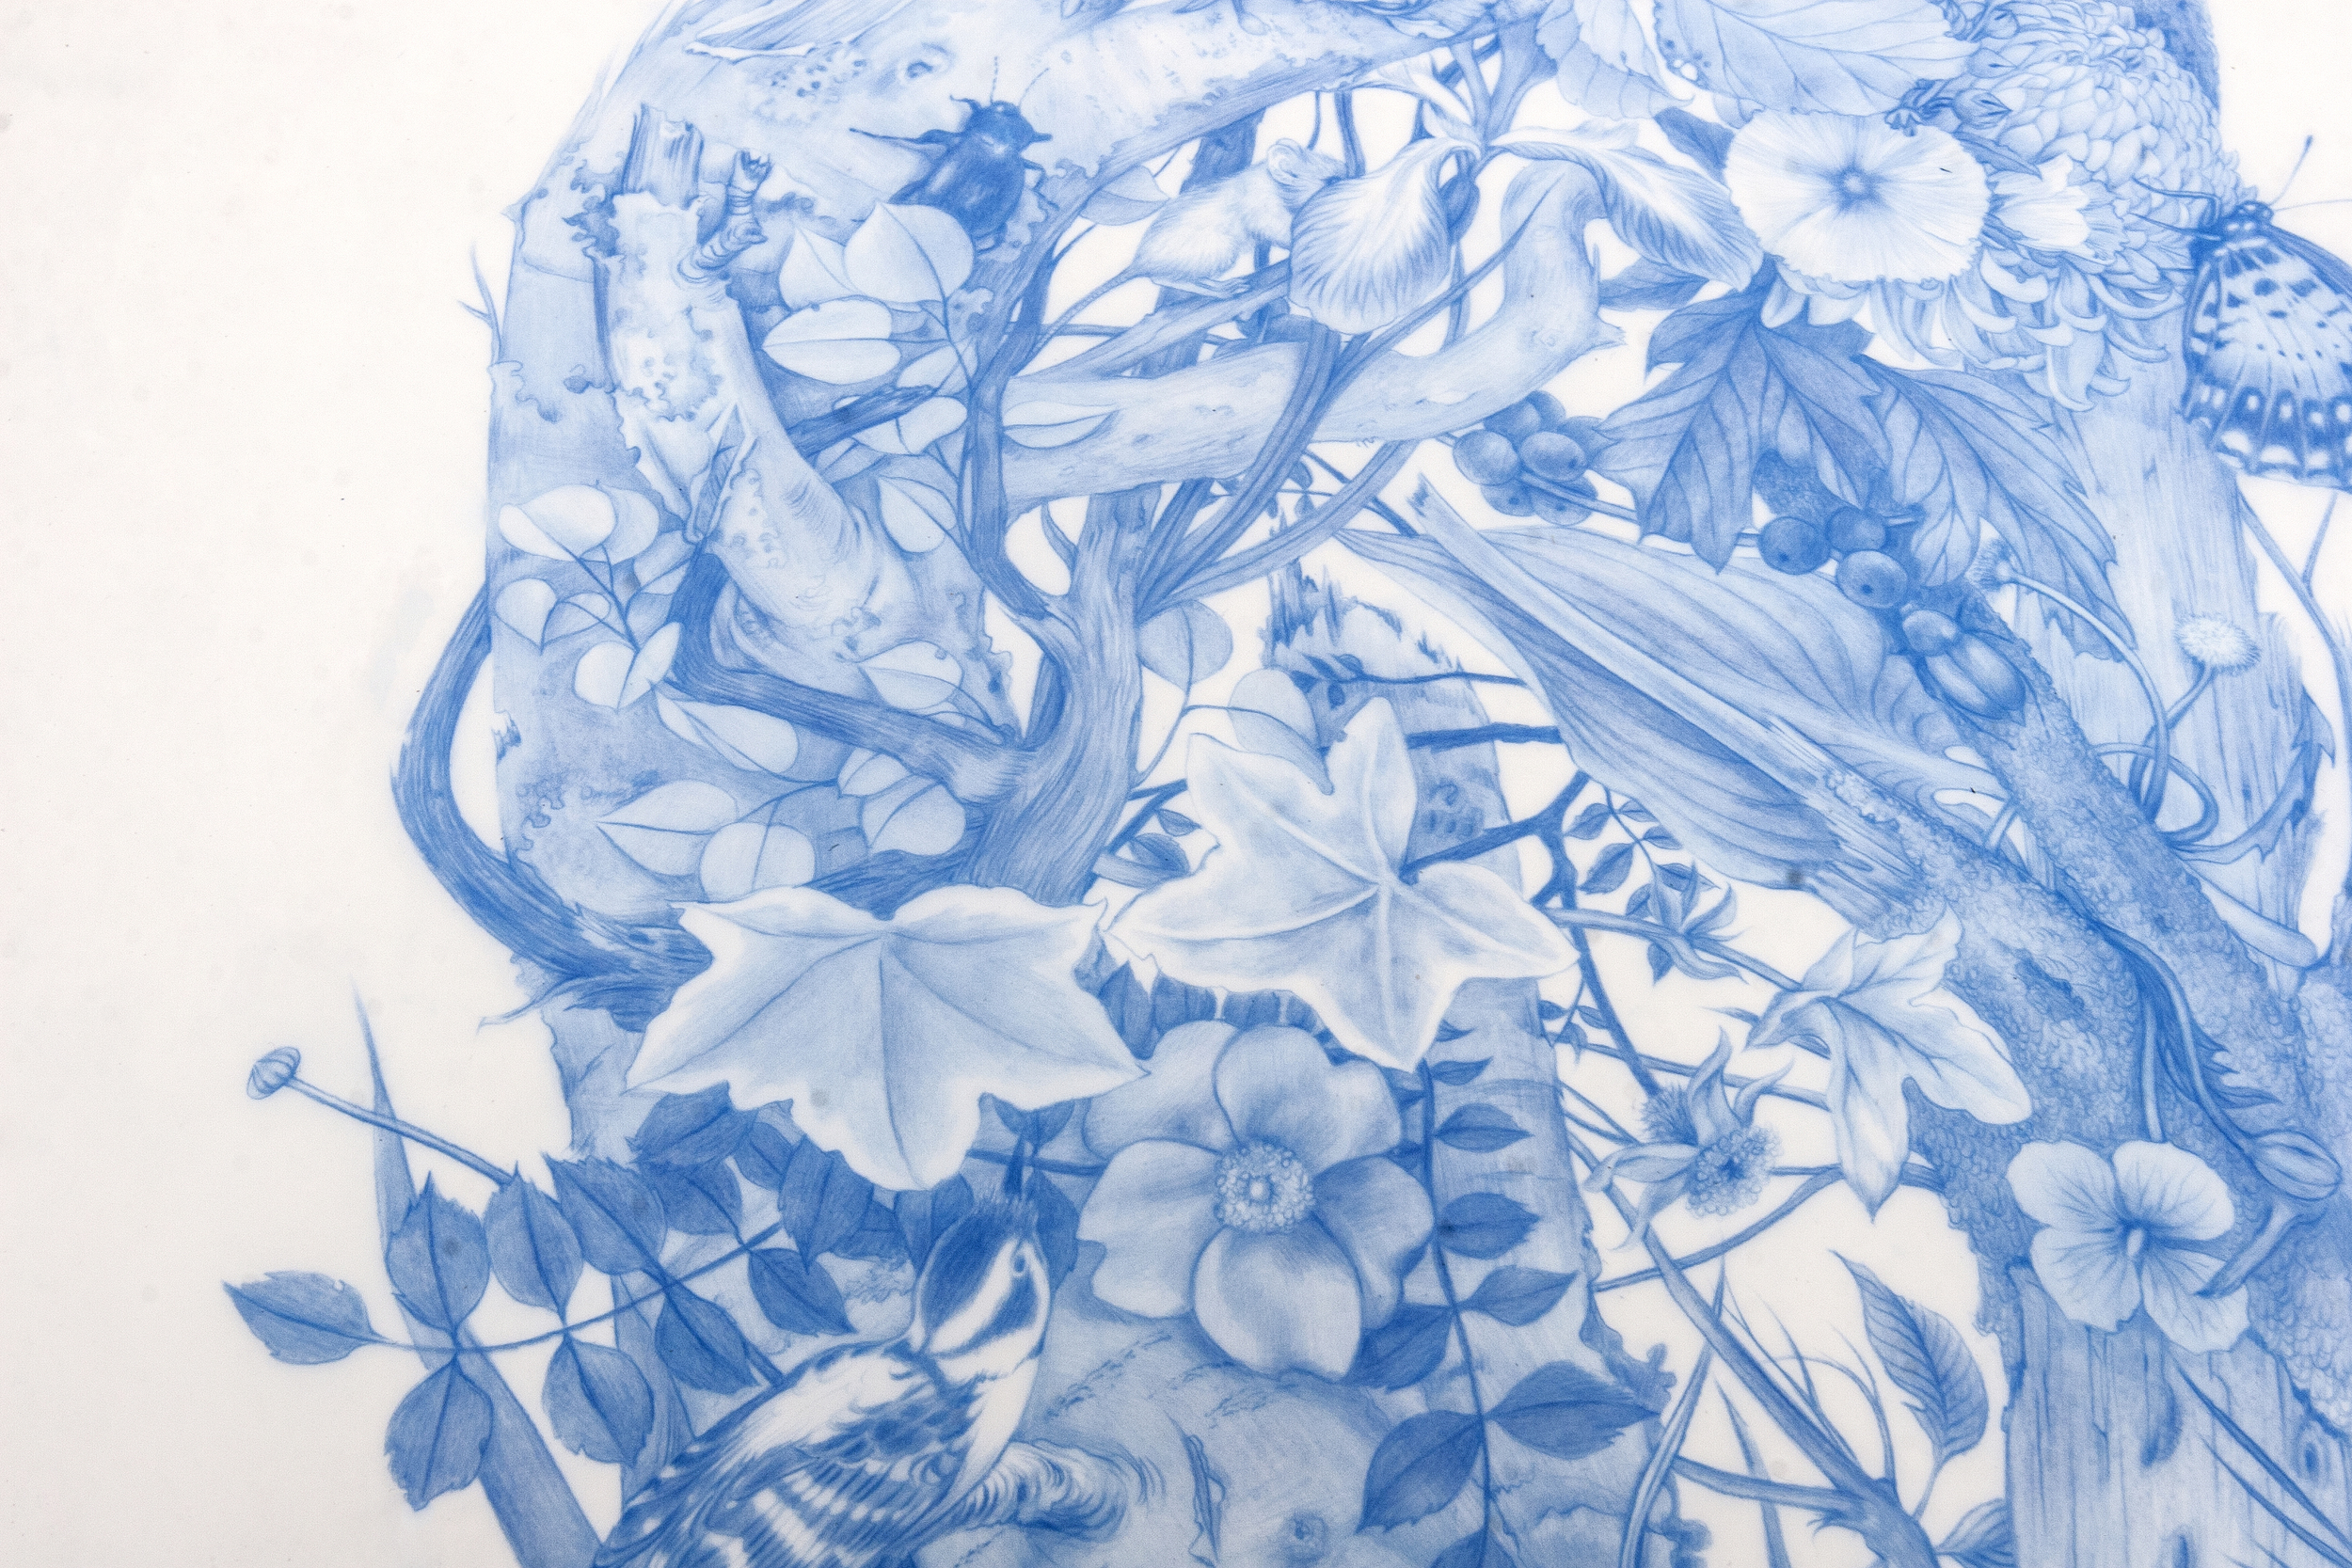 ZACHARI LOGAN, Green Man, (DETAIL), 2014 blue pencil on mylar, 28 x 18 inches